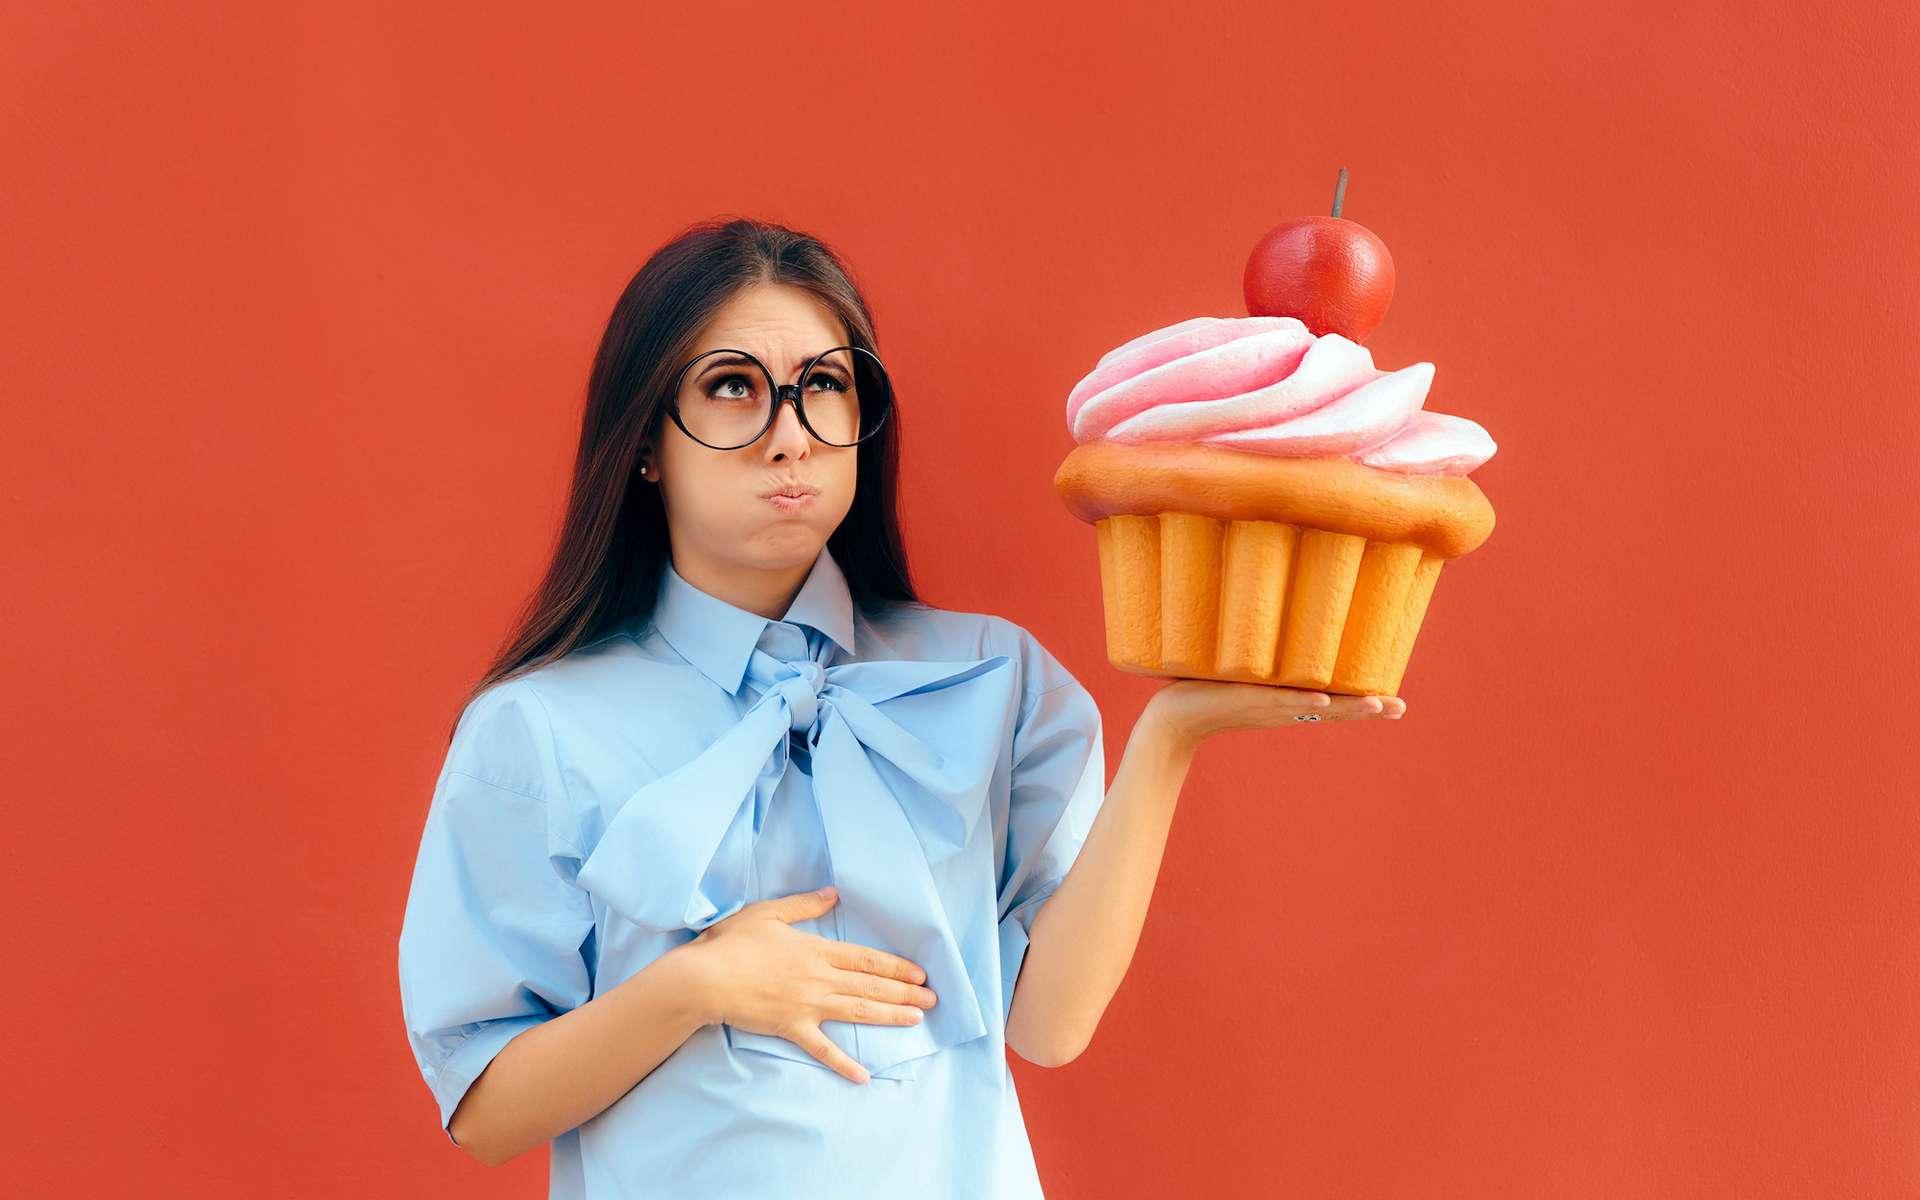 L'estomac peut se dilater jusqu'à 50 fois son volume initial. © Nicoletaionescu, Adobe Stock